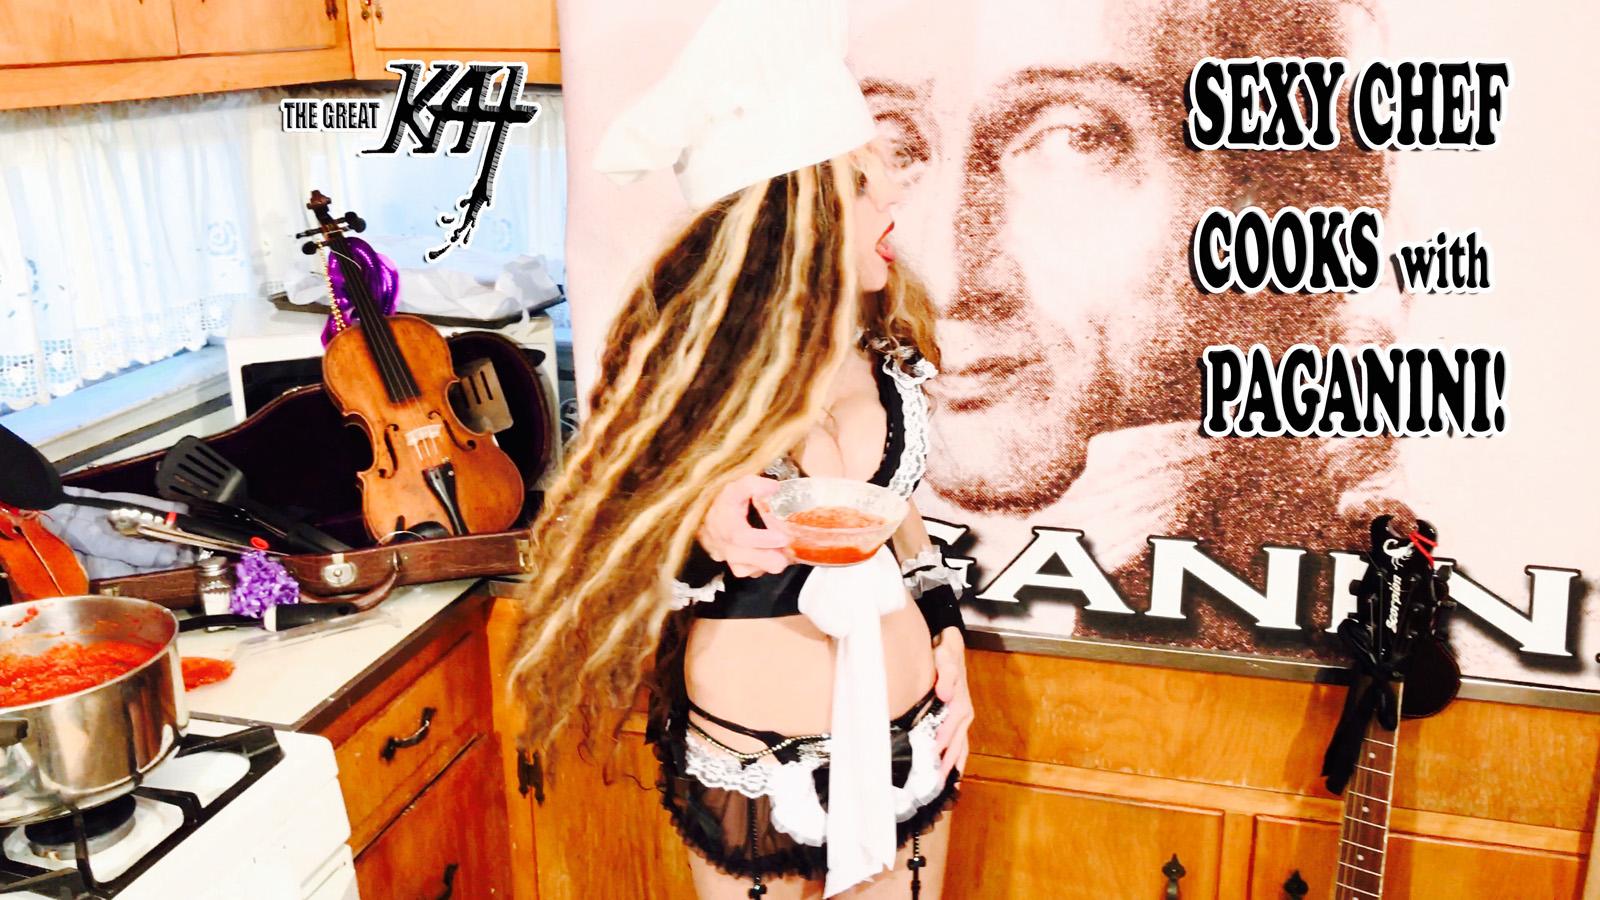 SEXY CHEF COOKS with PAGANINI! From CHEF GREAT KAT COOKS PAGANINI'S RAVIOLI!